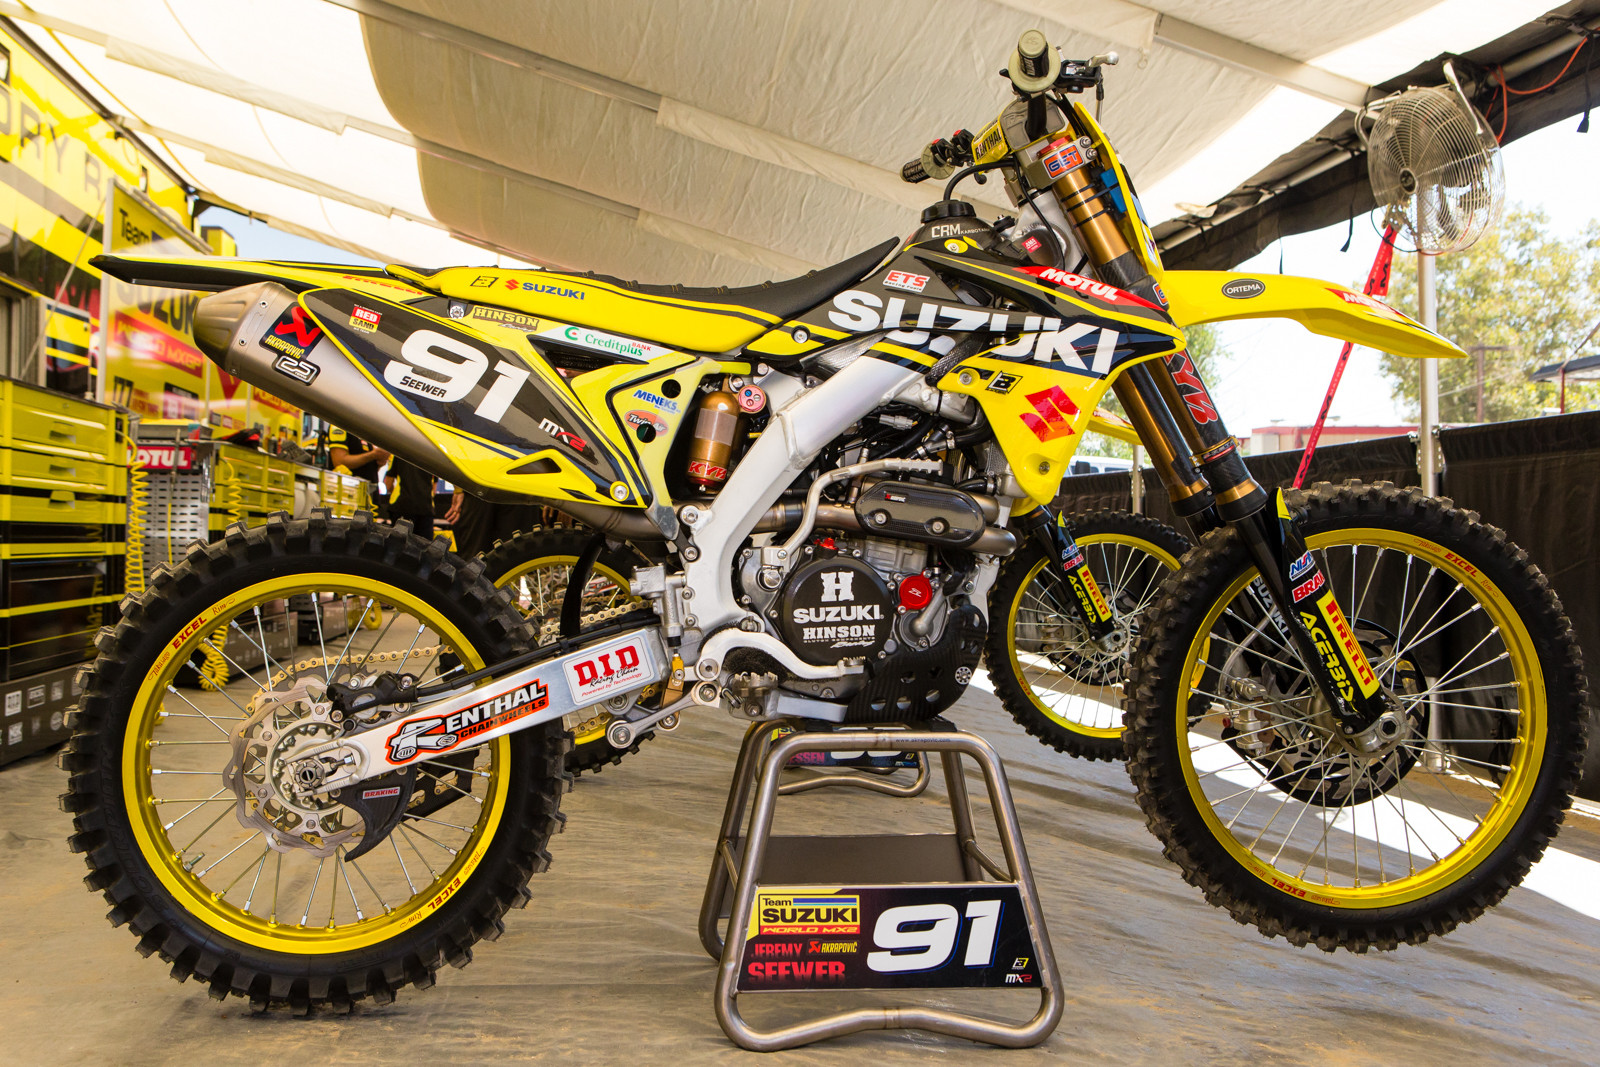 Jeremy Seewer's Suzuki World MX2 RM-Z250WS - Vital MX Pit Bits: 2016 MXGP of USA - Motocross Pictures - Vital MX